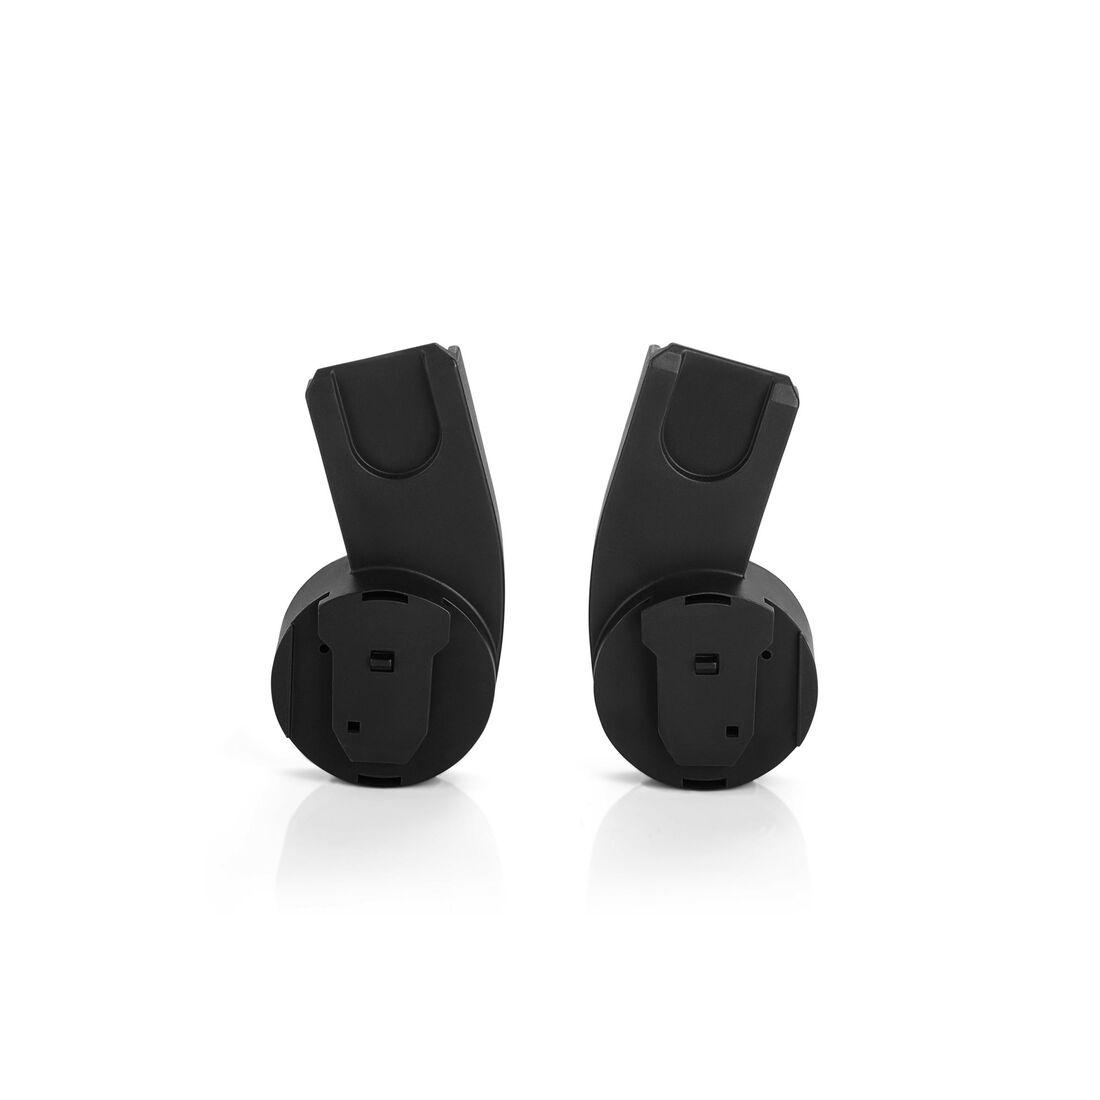 CYBEX Babyschalen Adapter Balios S Talos S Line - Black in Black large Bild 1